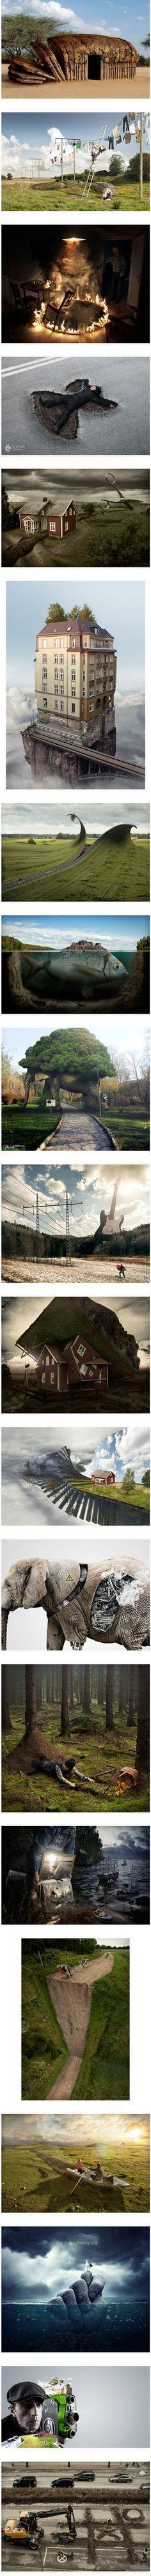 Photo Manipulations